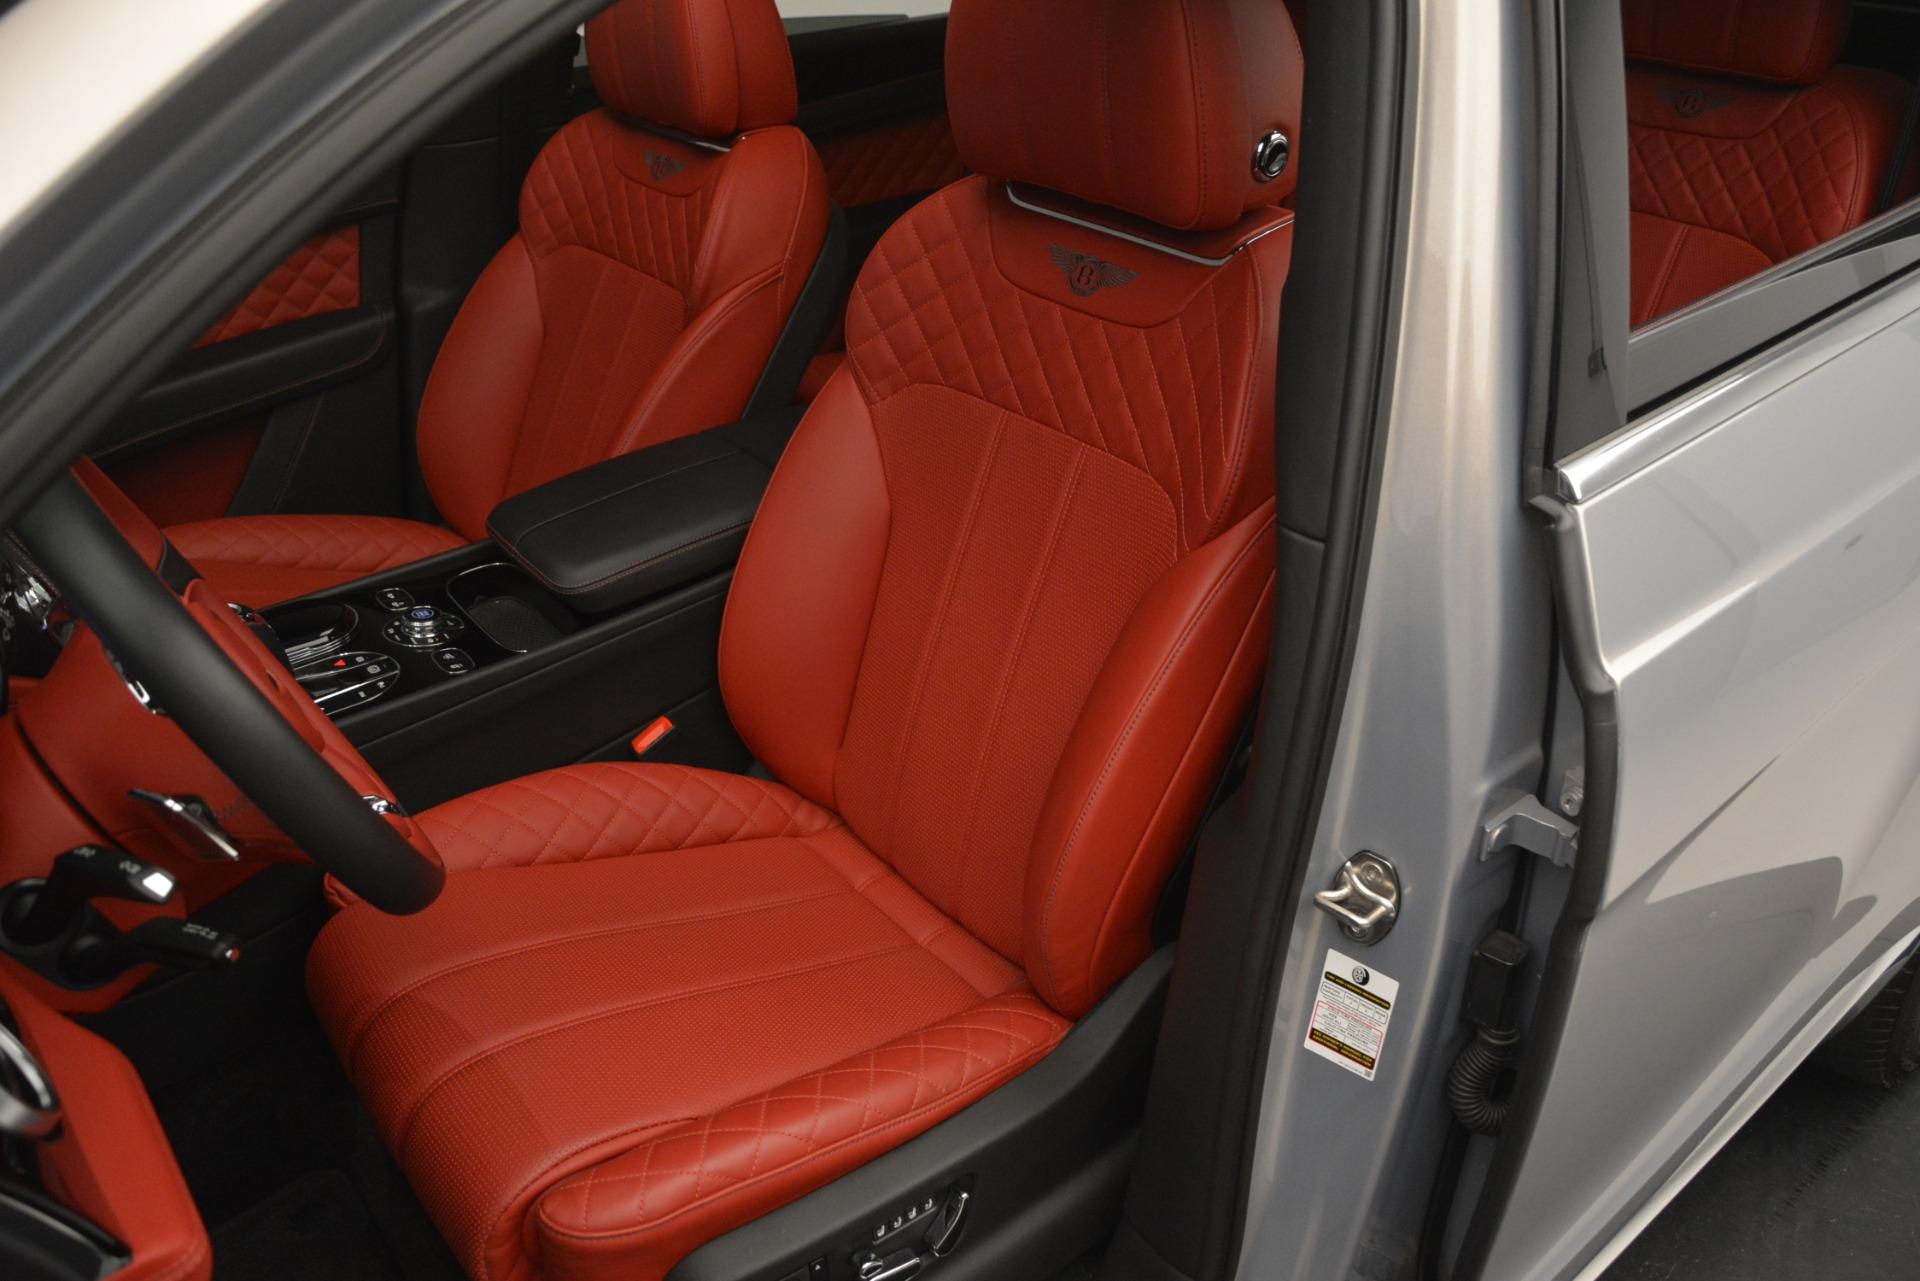 Used 2017 Bentley Bentayga W12 For Sale In Greenwich, CT. Alfa Romeo of Greenwich, 7438 2641_p18